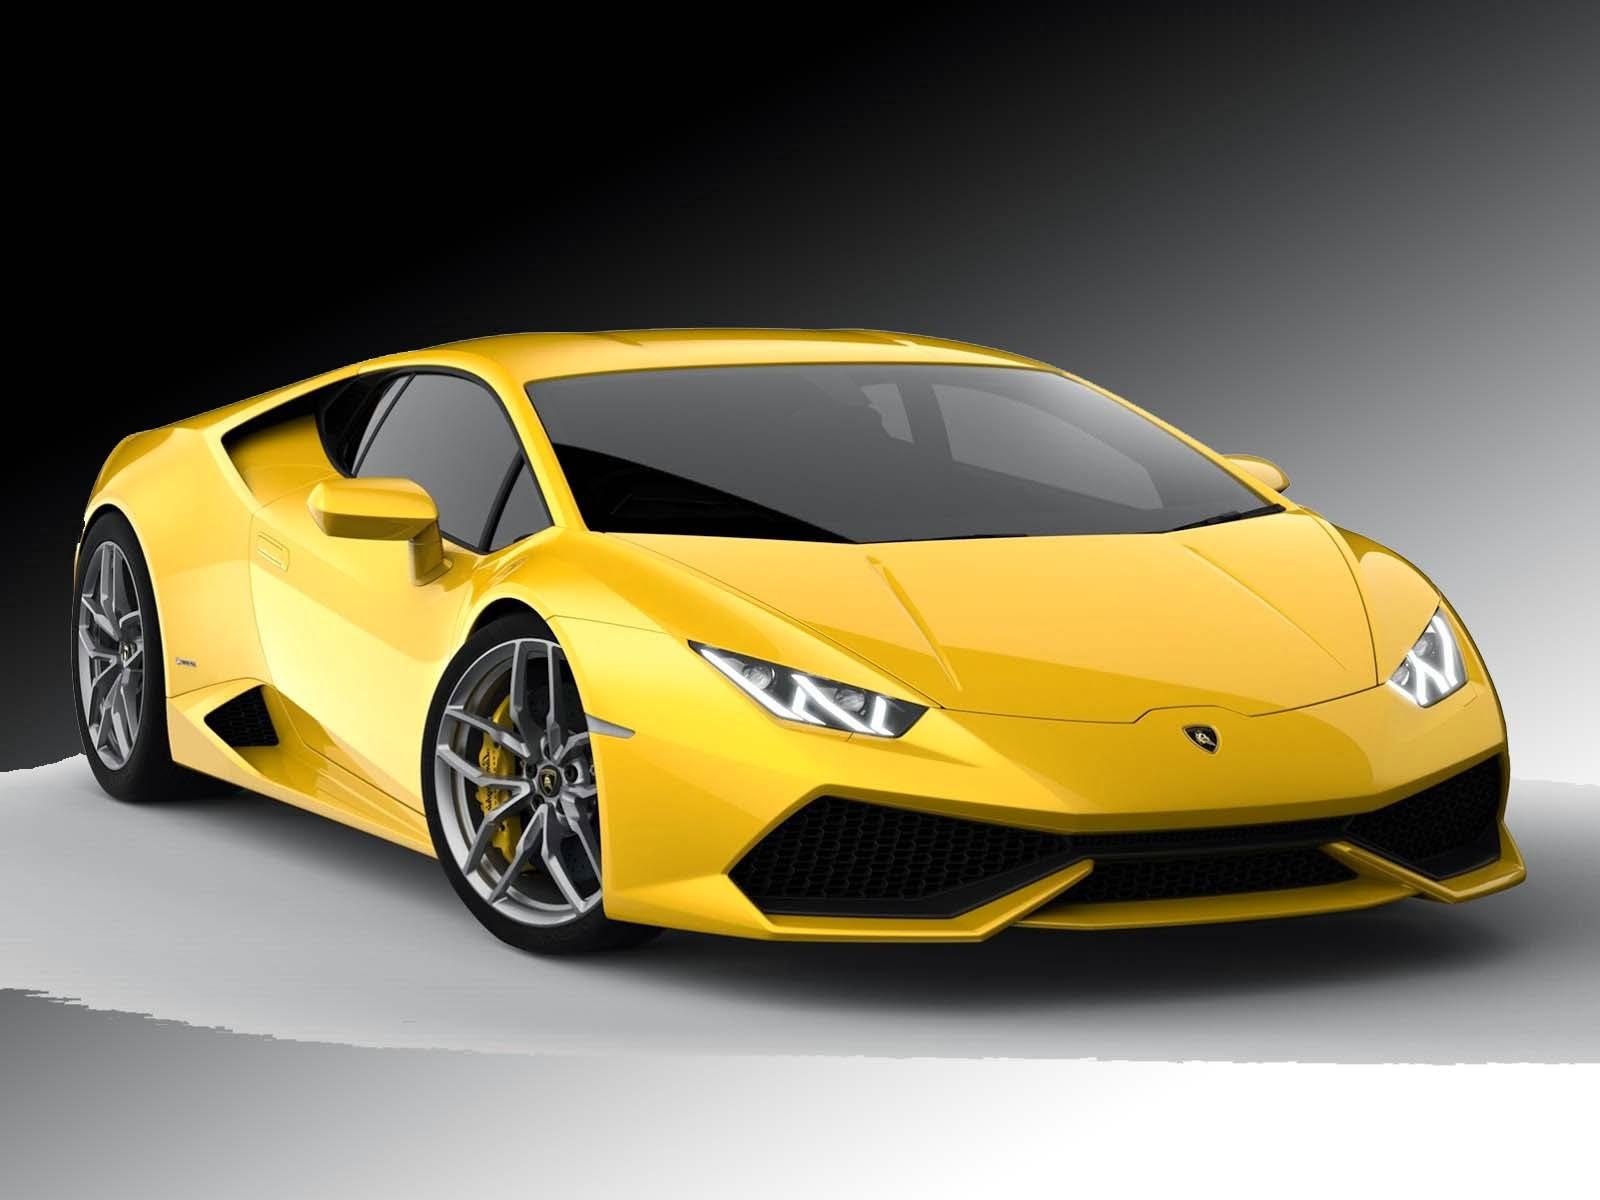 Lamborghini Huracan LP610-4 Hd Wallpapers stills images |TechGangs